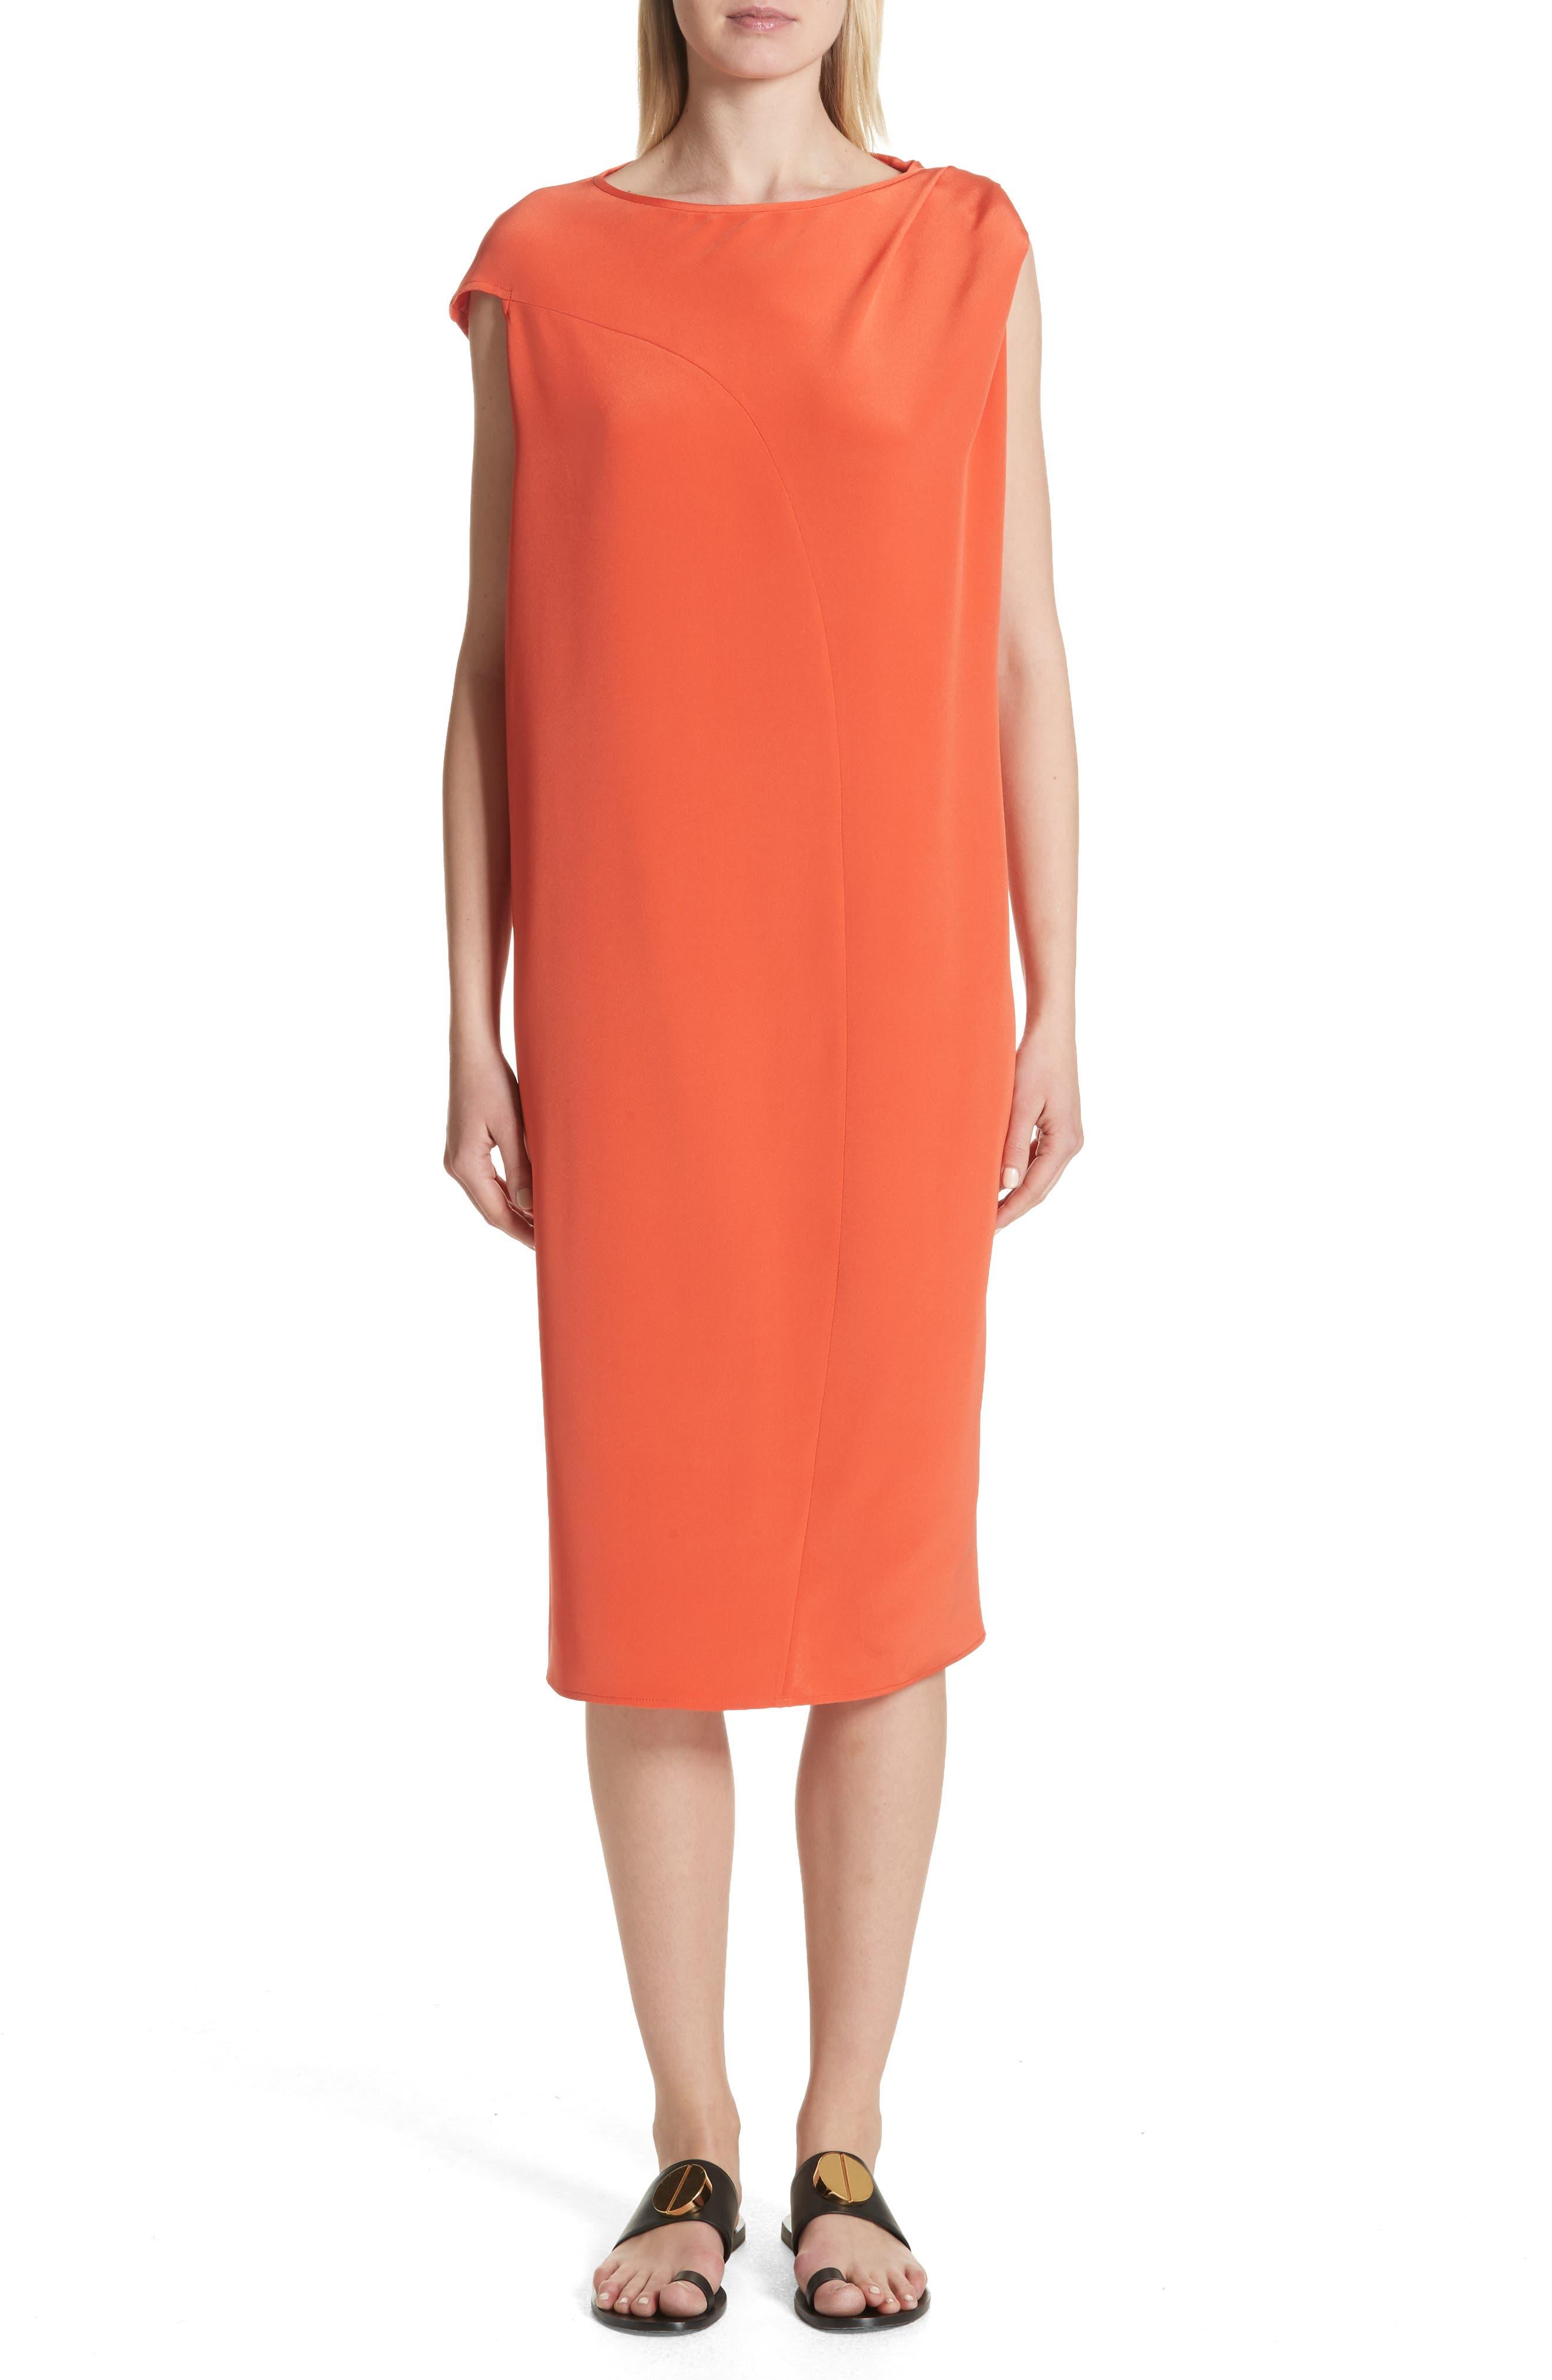 Twist Detail Silk Dress,                             Main thumbnail 1, color,                             Persimmon Orange